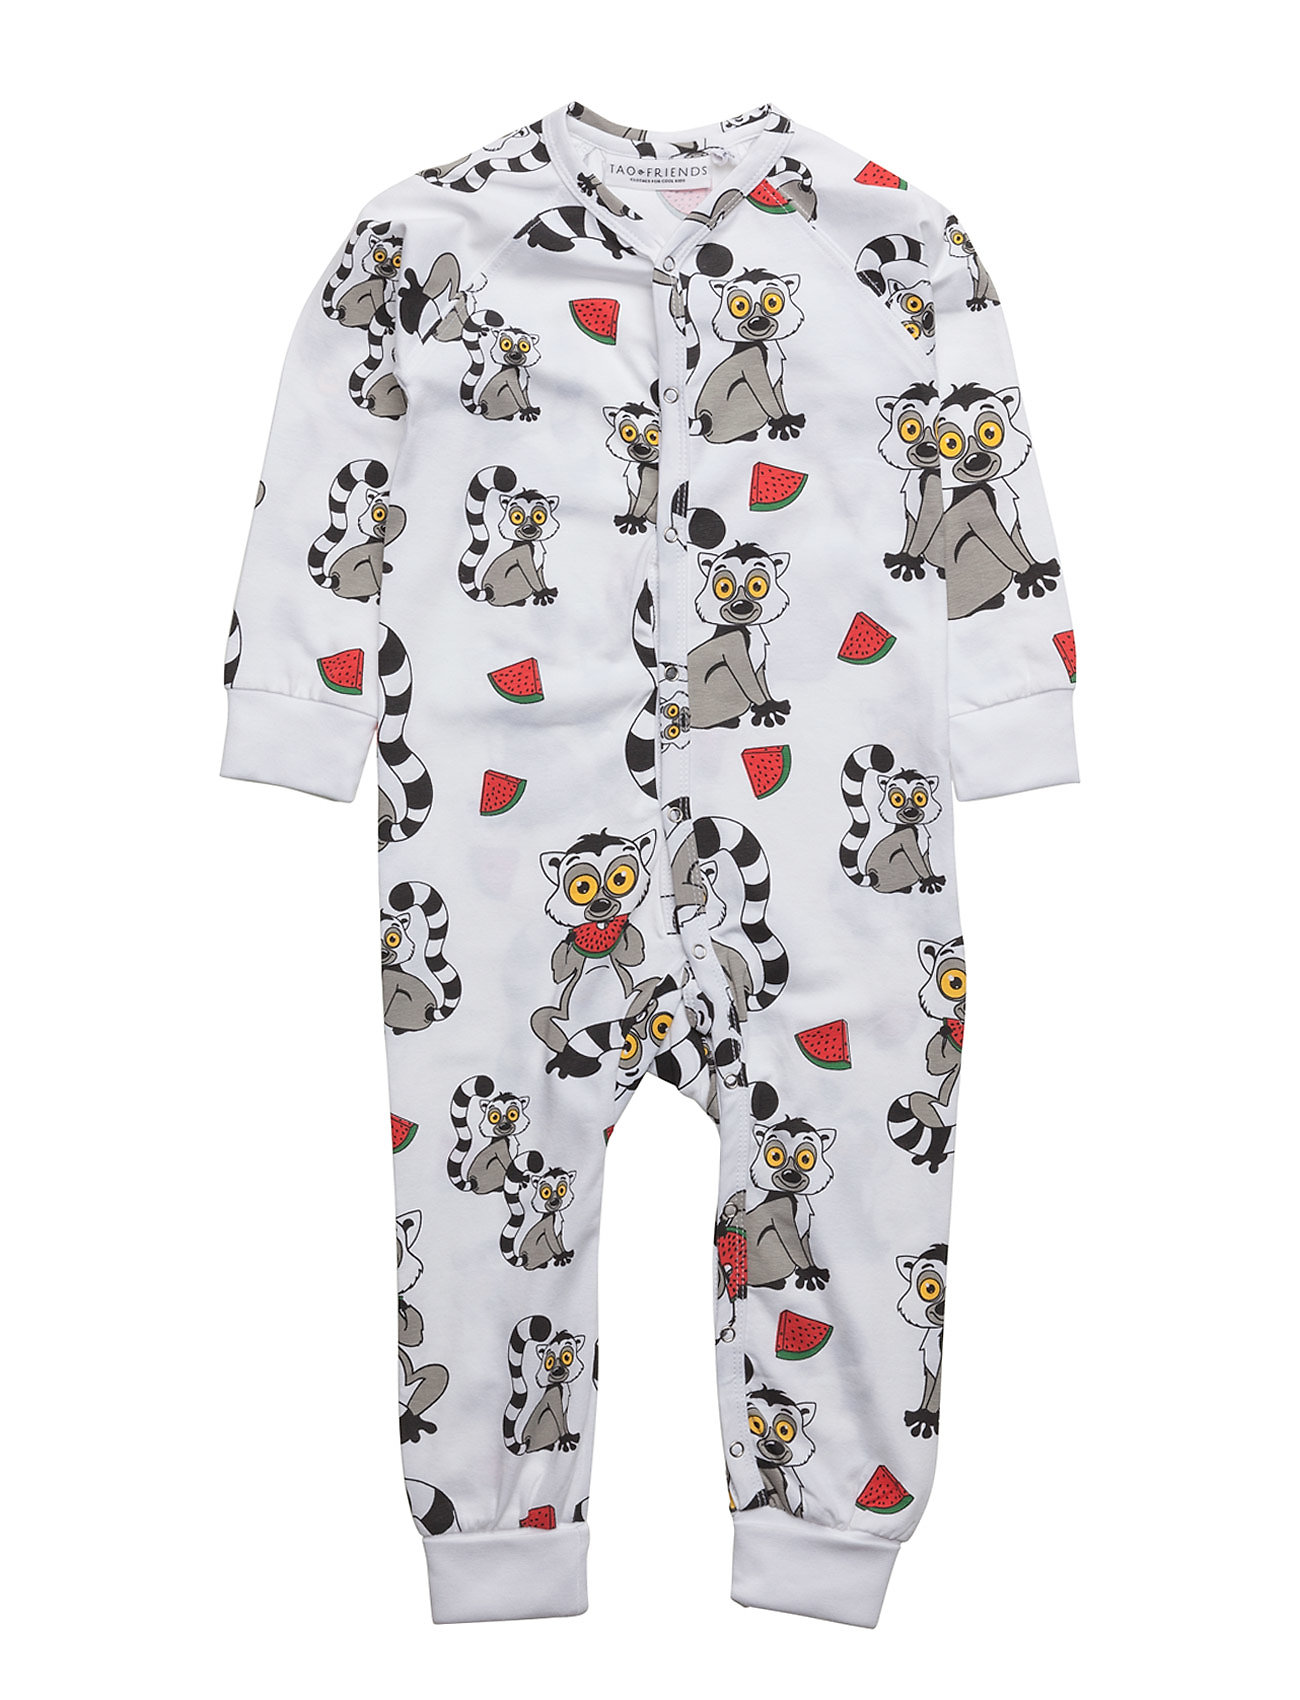 Pj Lemuren Multi-Animal White One-Piece Tao & friends Pyjamas til Børn i hvid